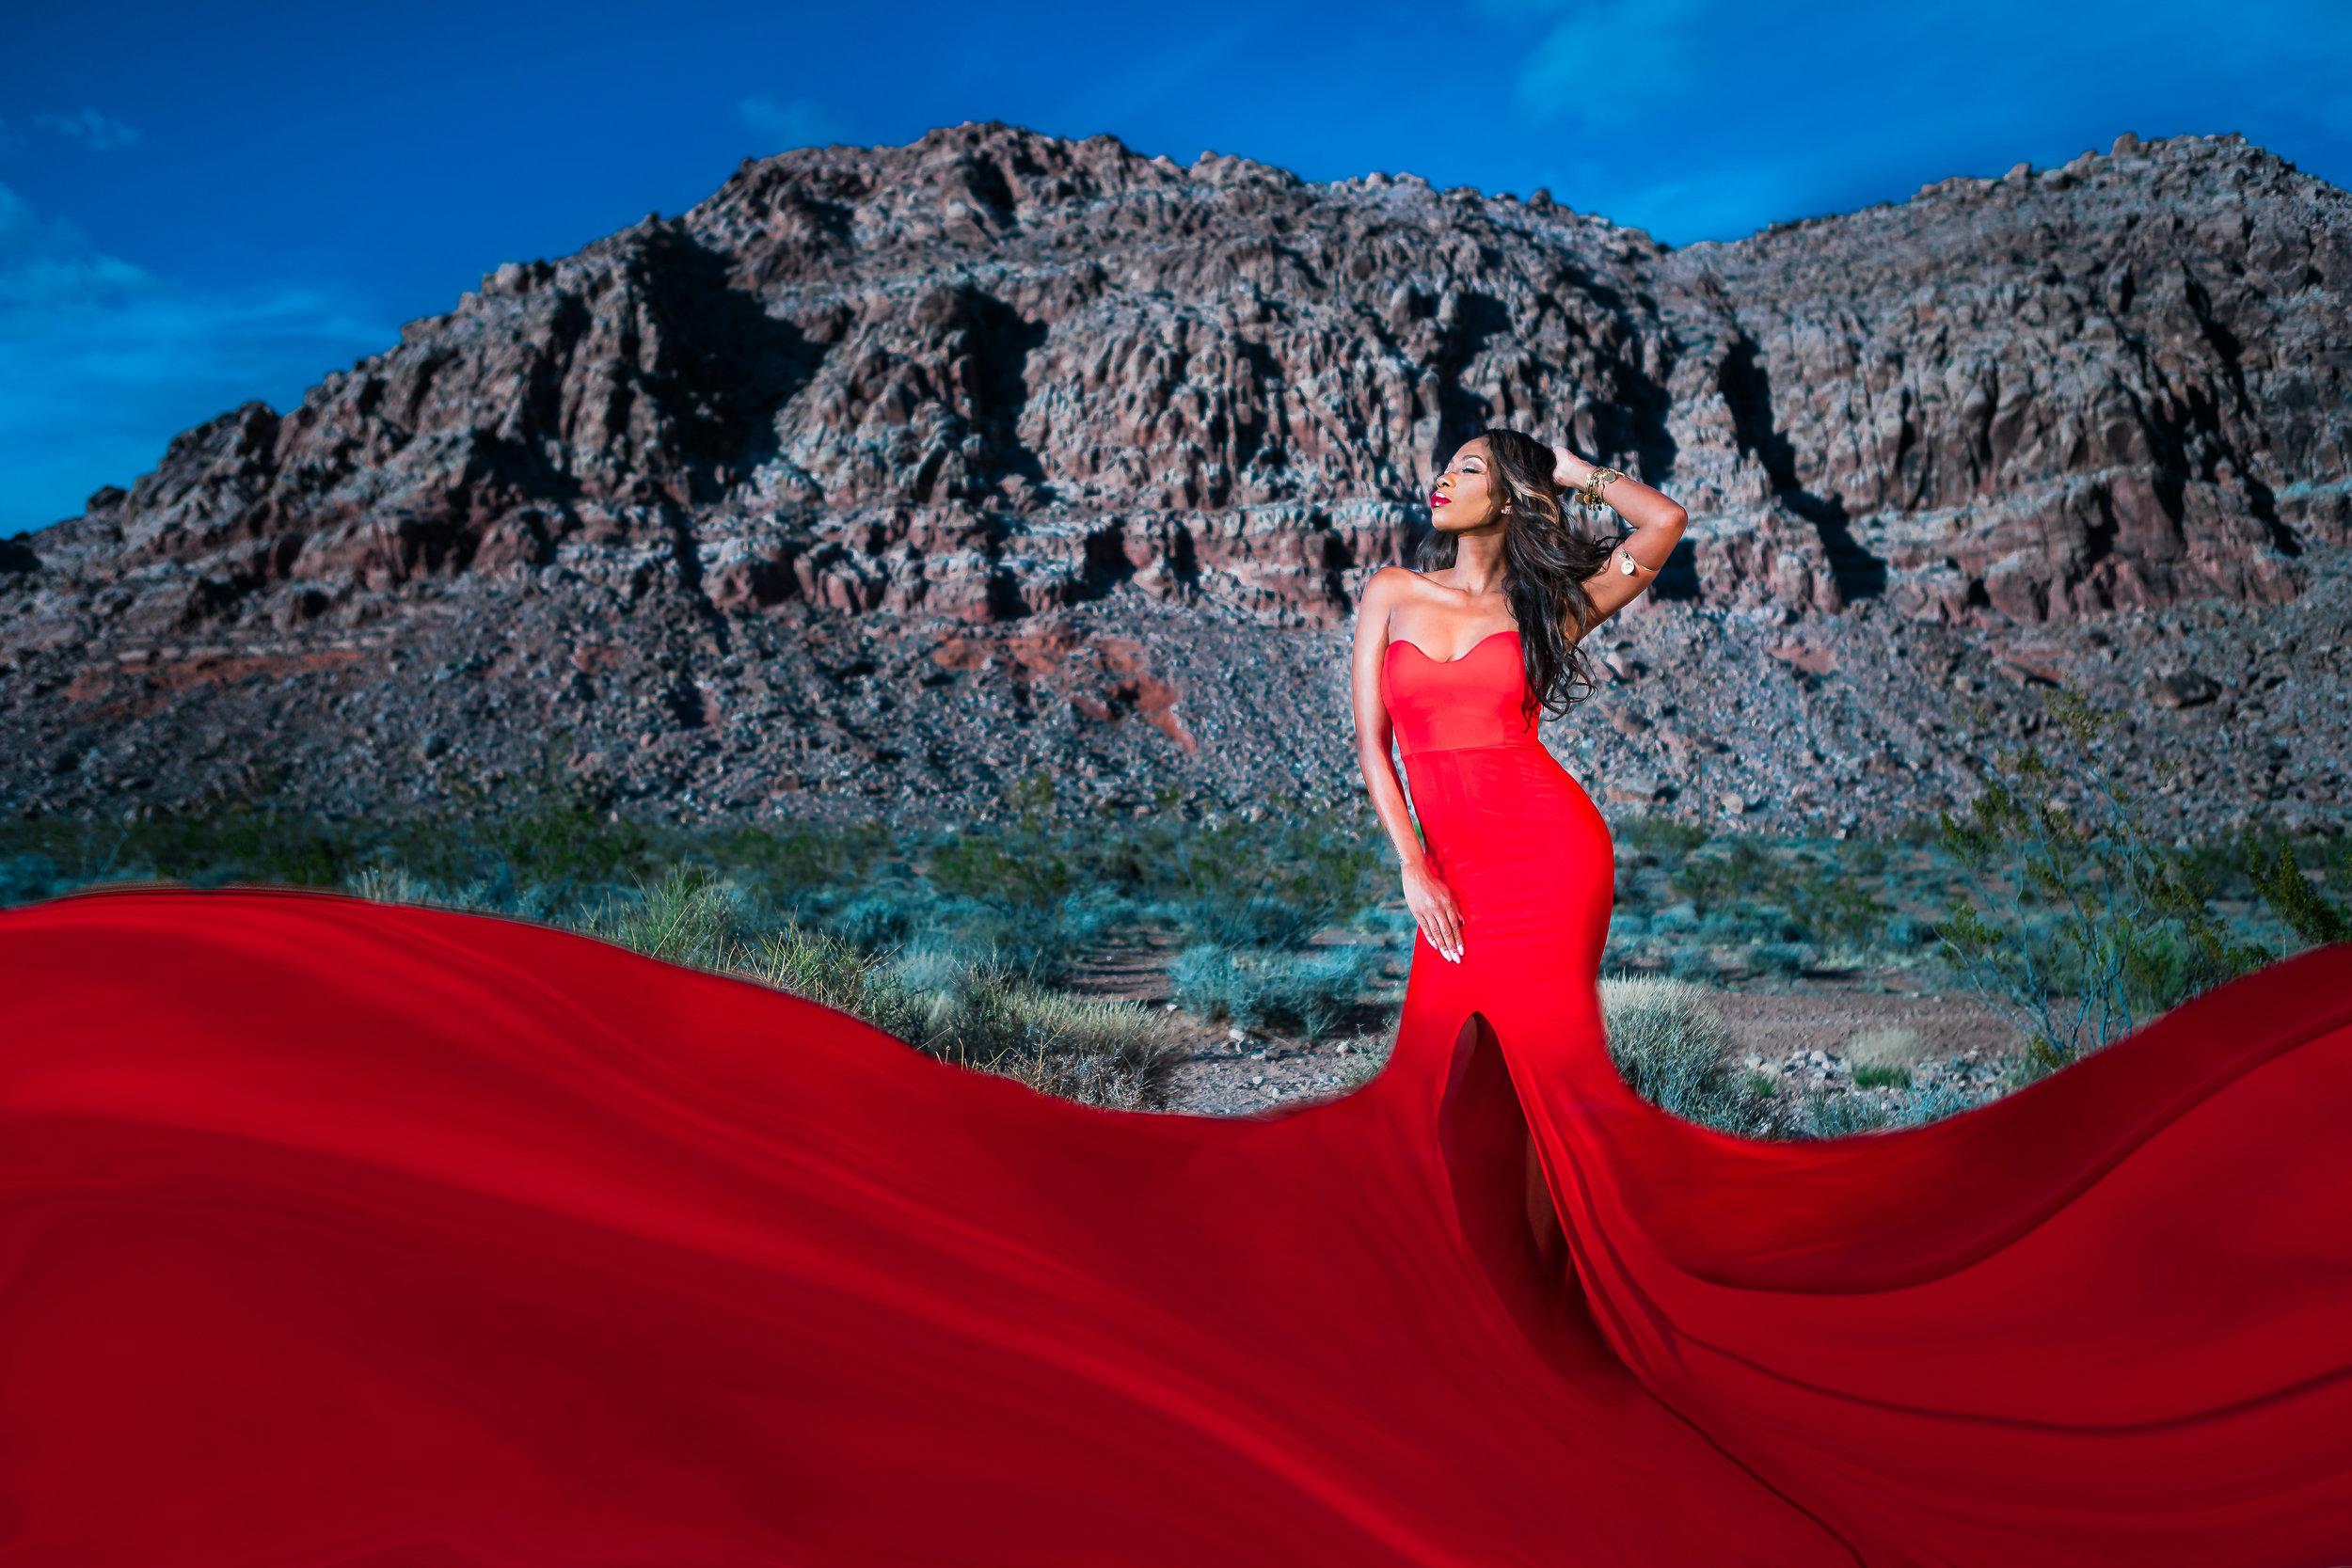 New_York_Photographer_Las_Vegas_Desert-243.jpg